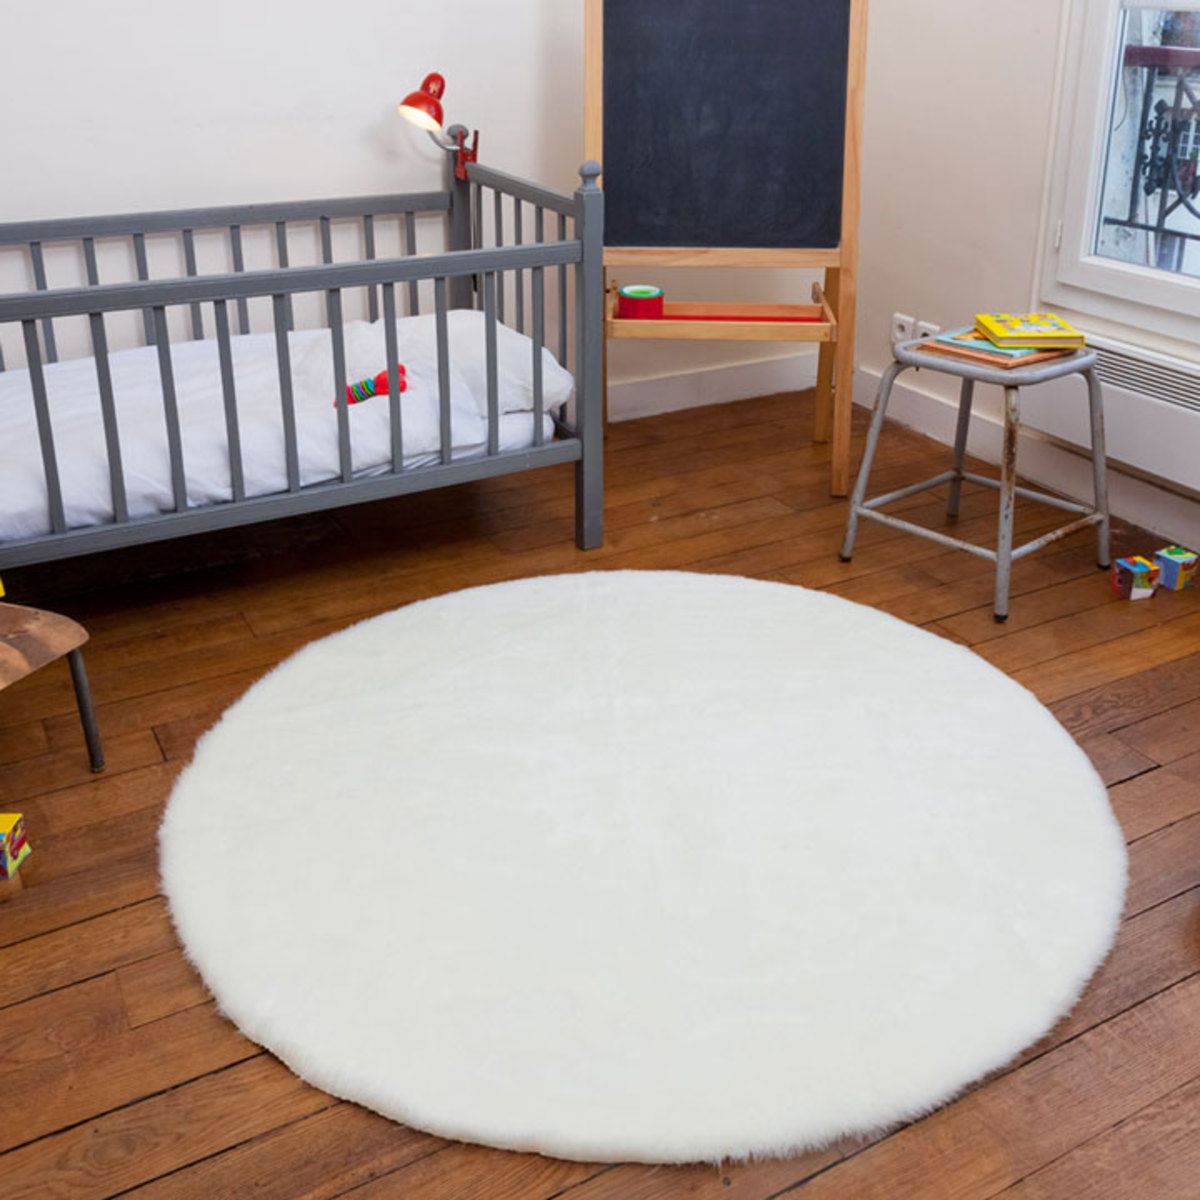 tapis tapis rond fausse fourrure blanc 140 cm tapis rond fausse fourrure blanc 140 cm. Black Bedroom Furniture Sets. Home Design Ideas